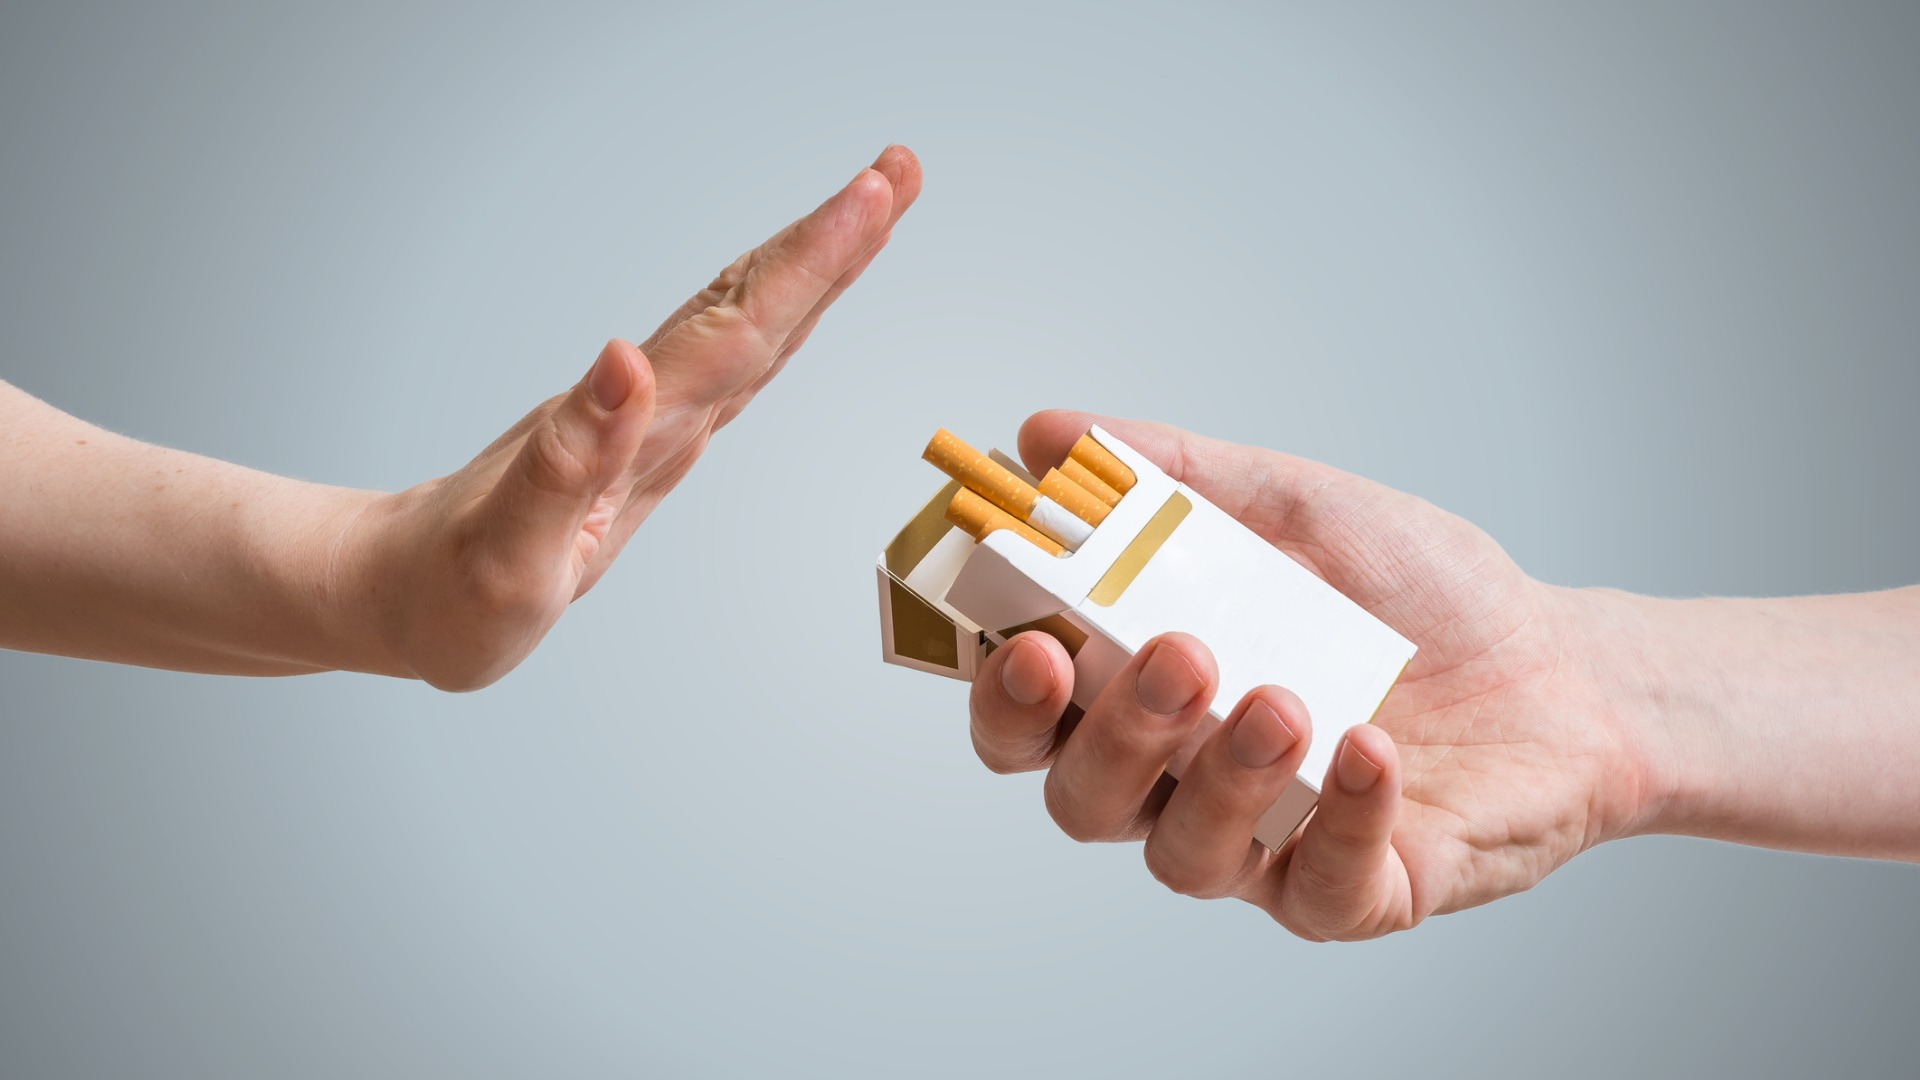 Salut bucodental i tabac